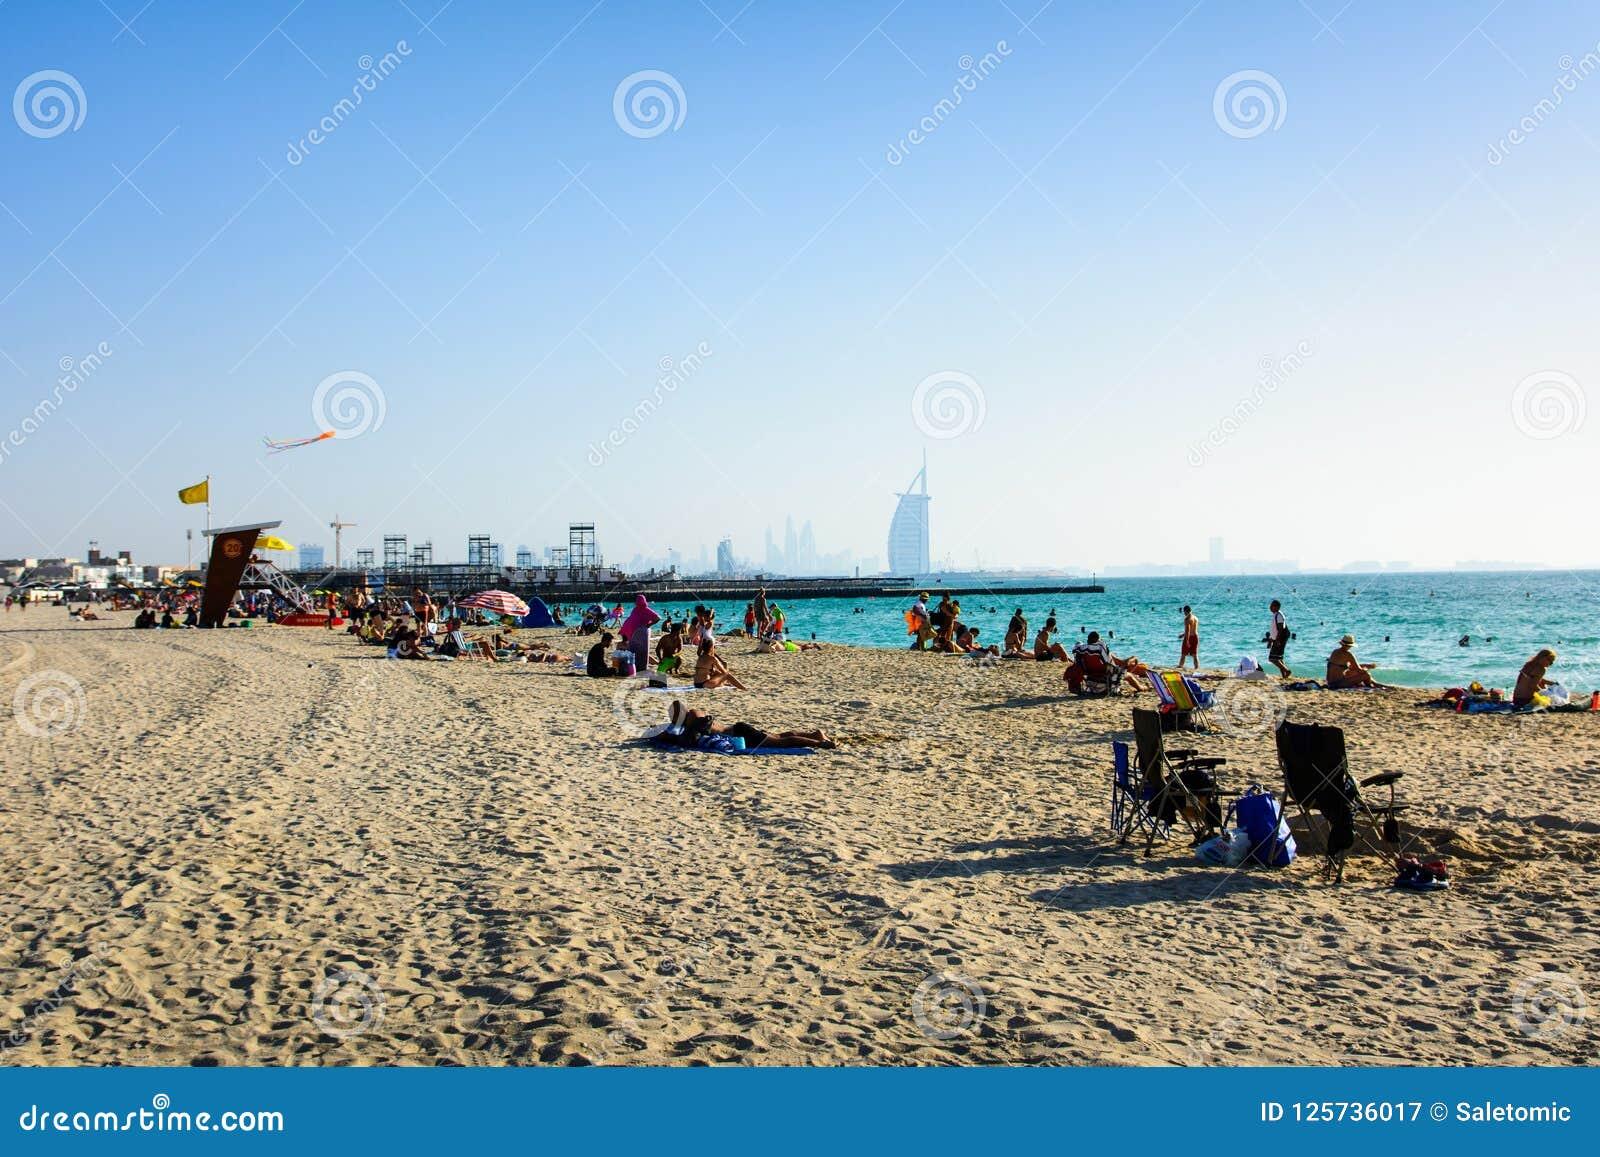 Dubai United Arab Emirates April 20 2018 Kite Beach In Dubai